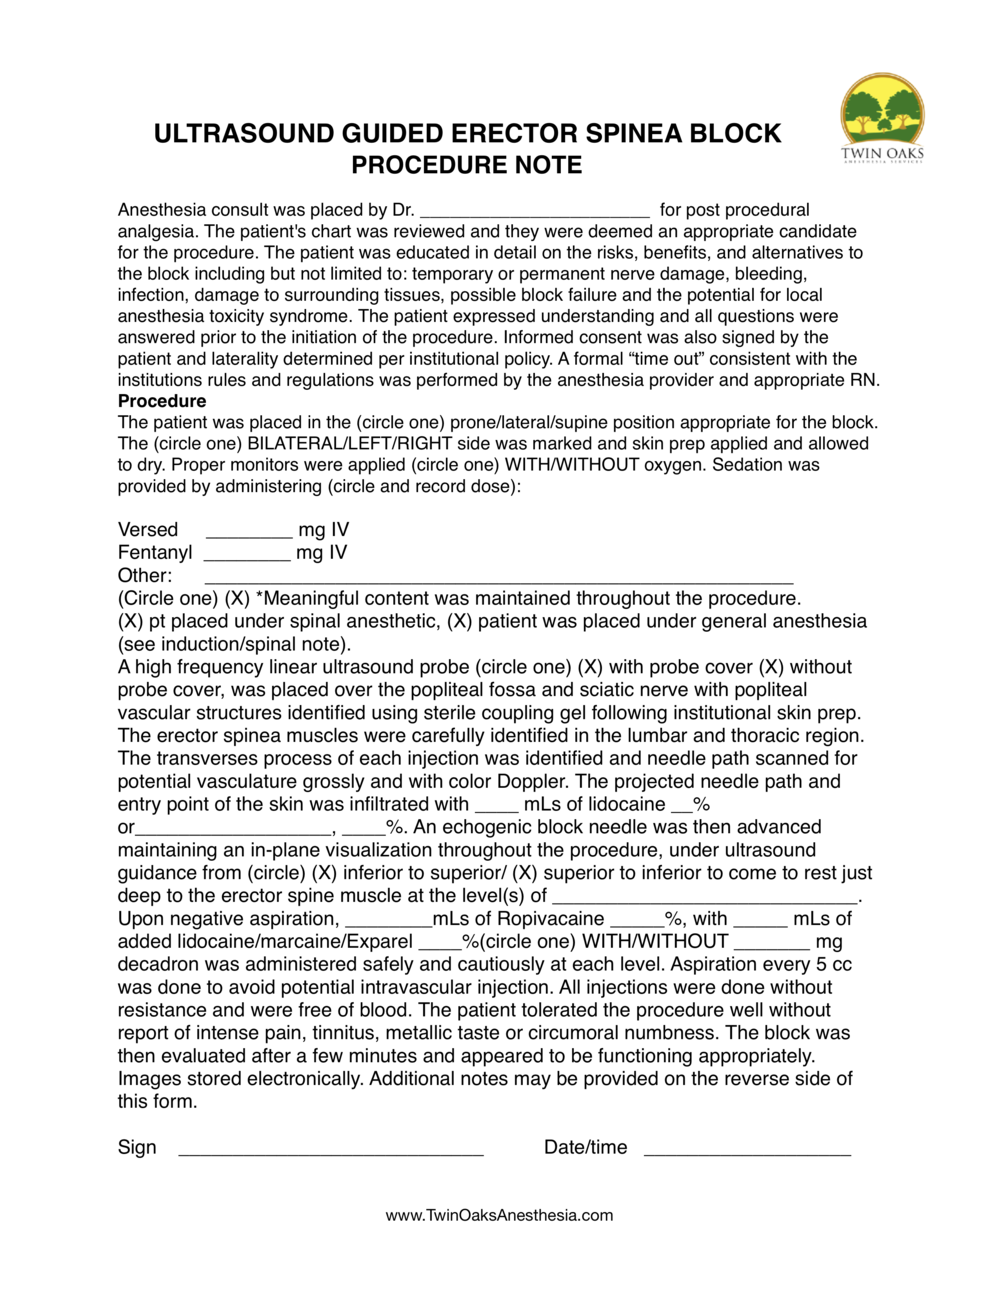 erector spinea procedure Form.png